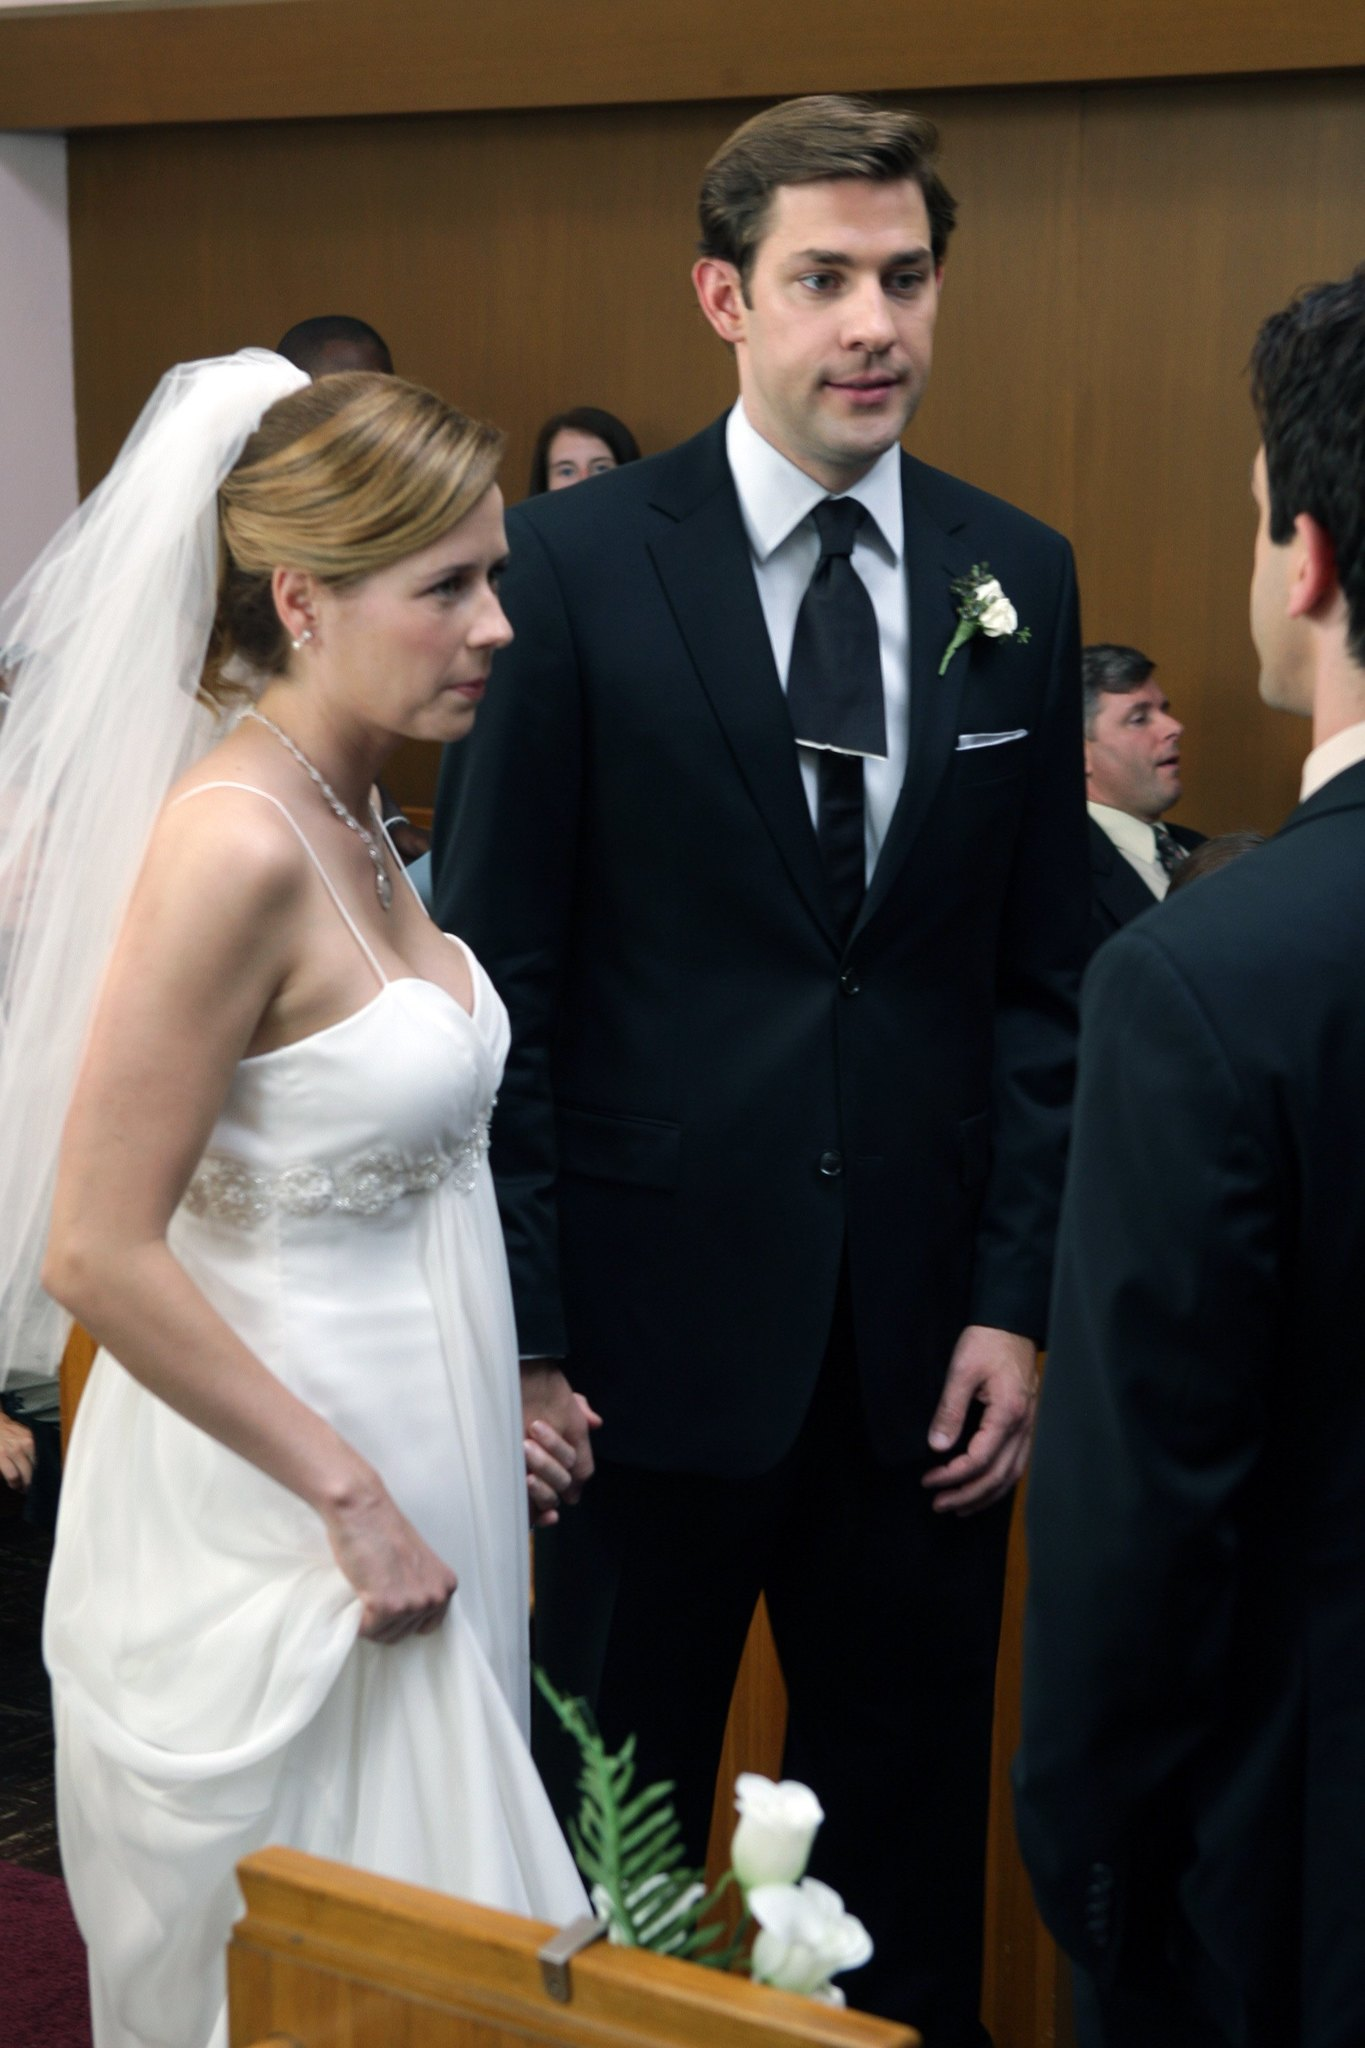 Jenna Fischer, John Krasinski, and B.J. Novak in The Office (2005)